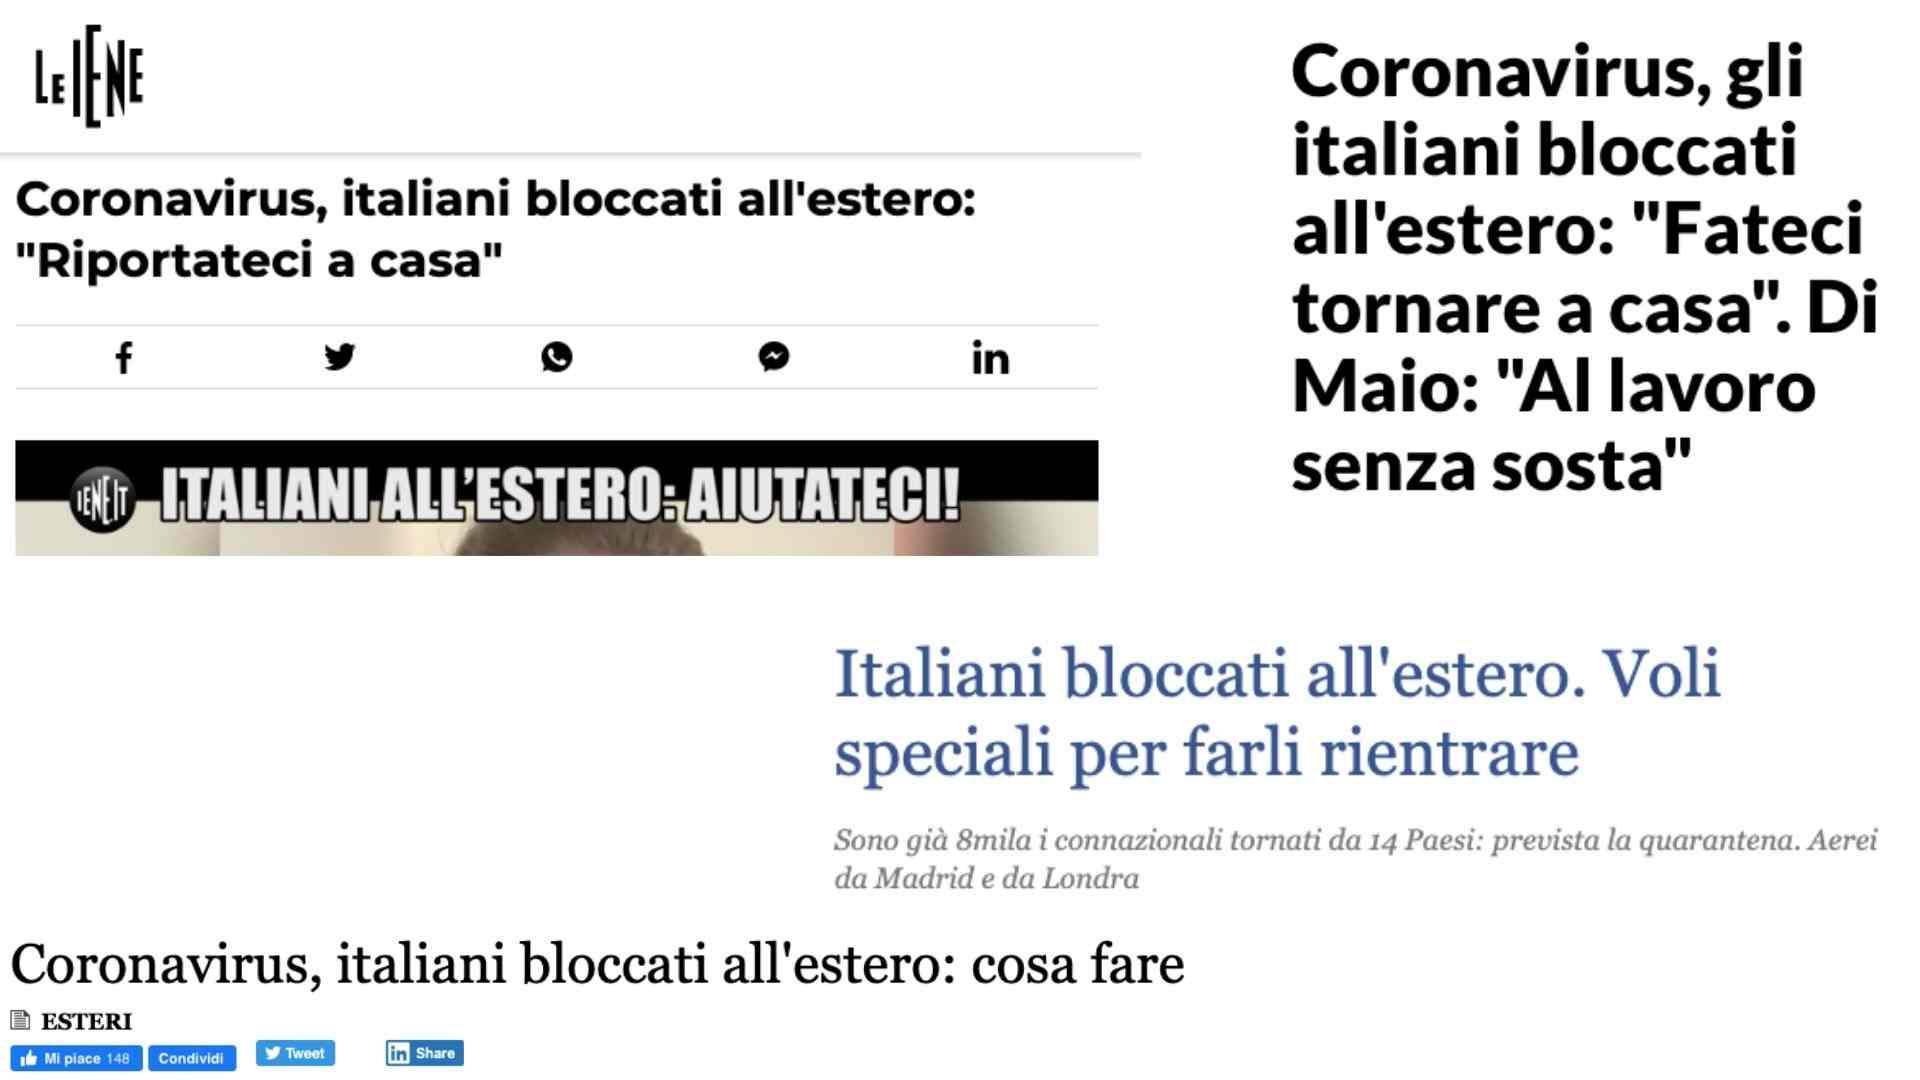 Italiani-bloccati-estero-coronavirus